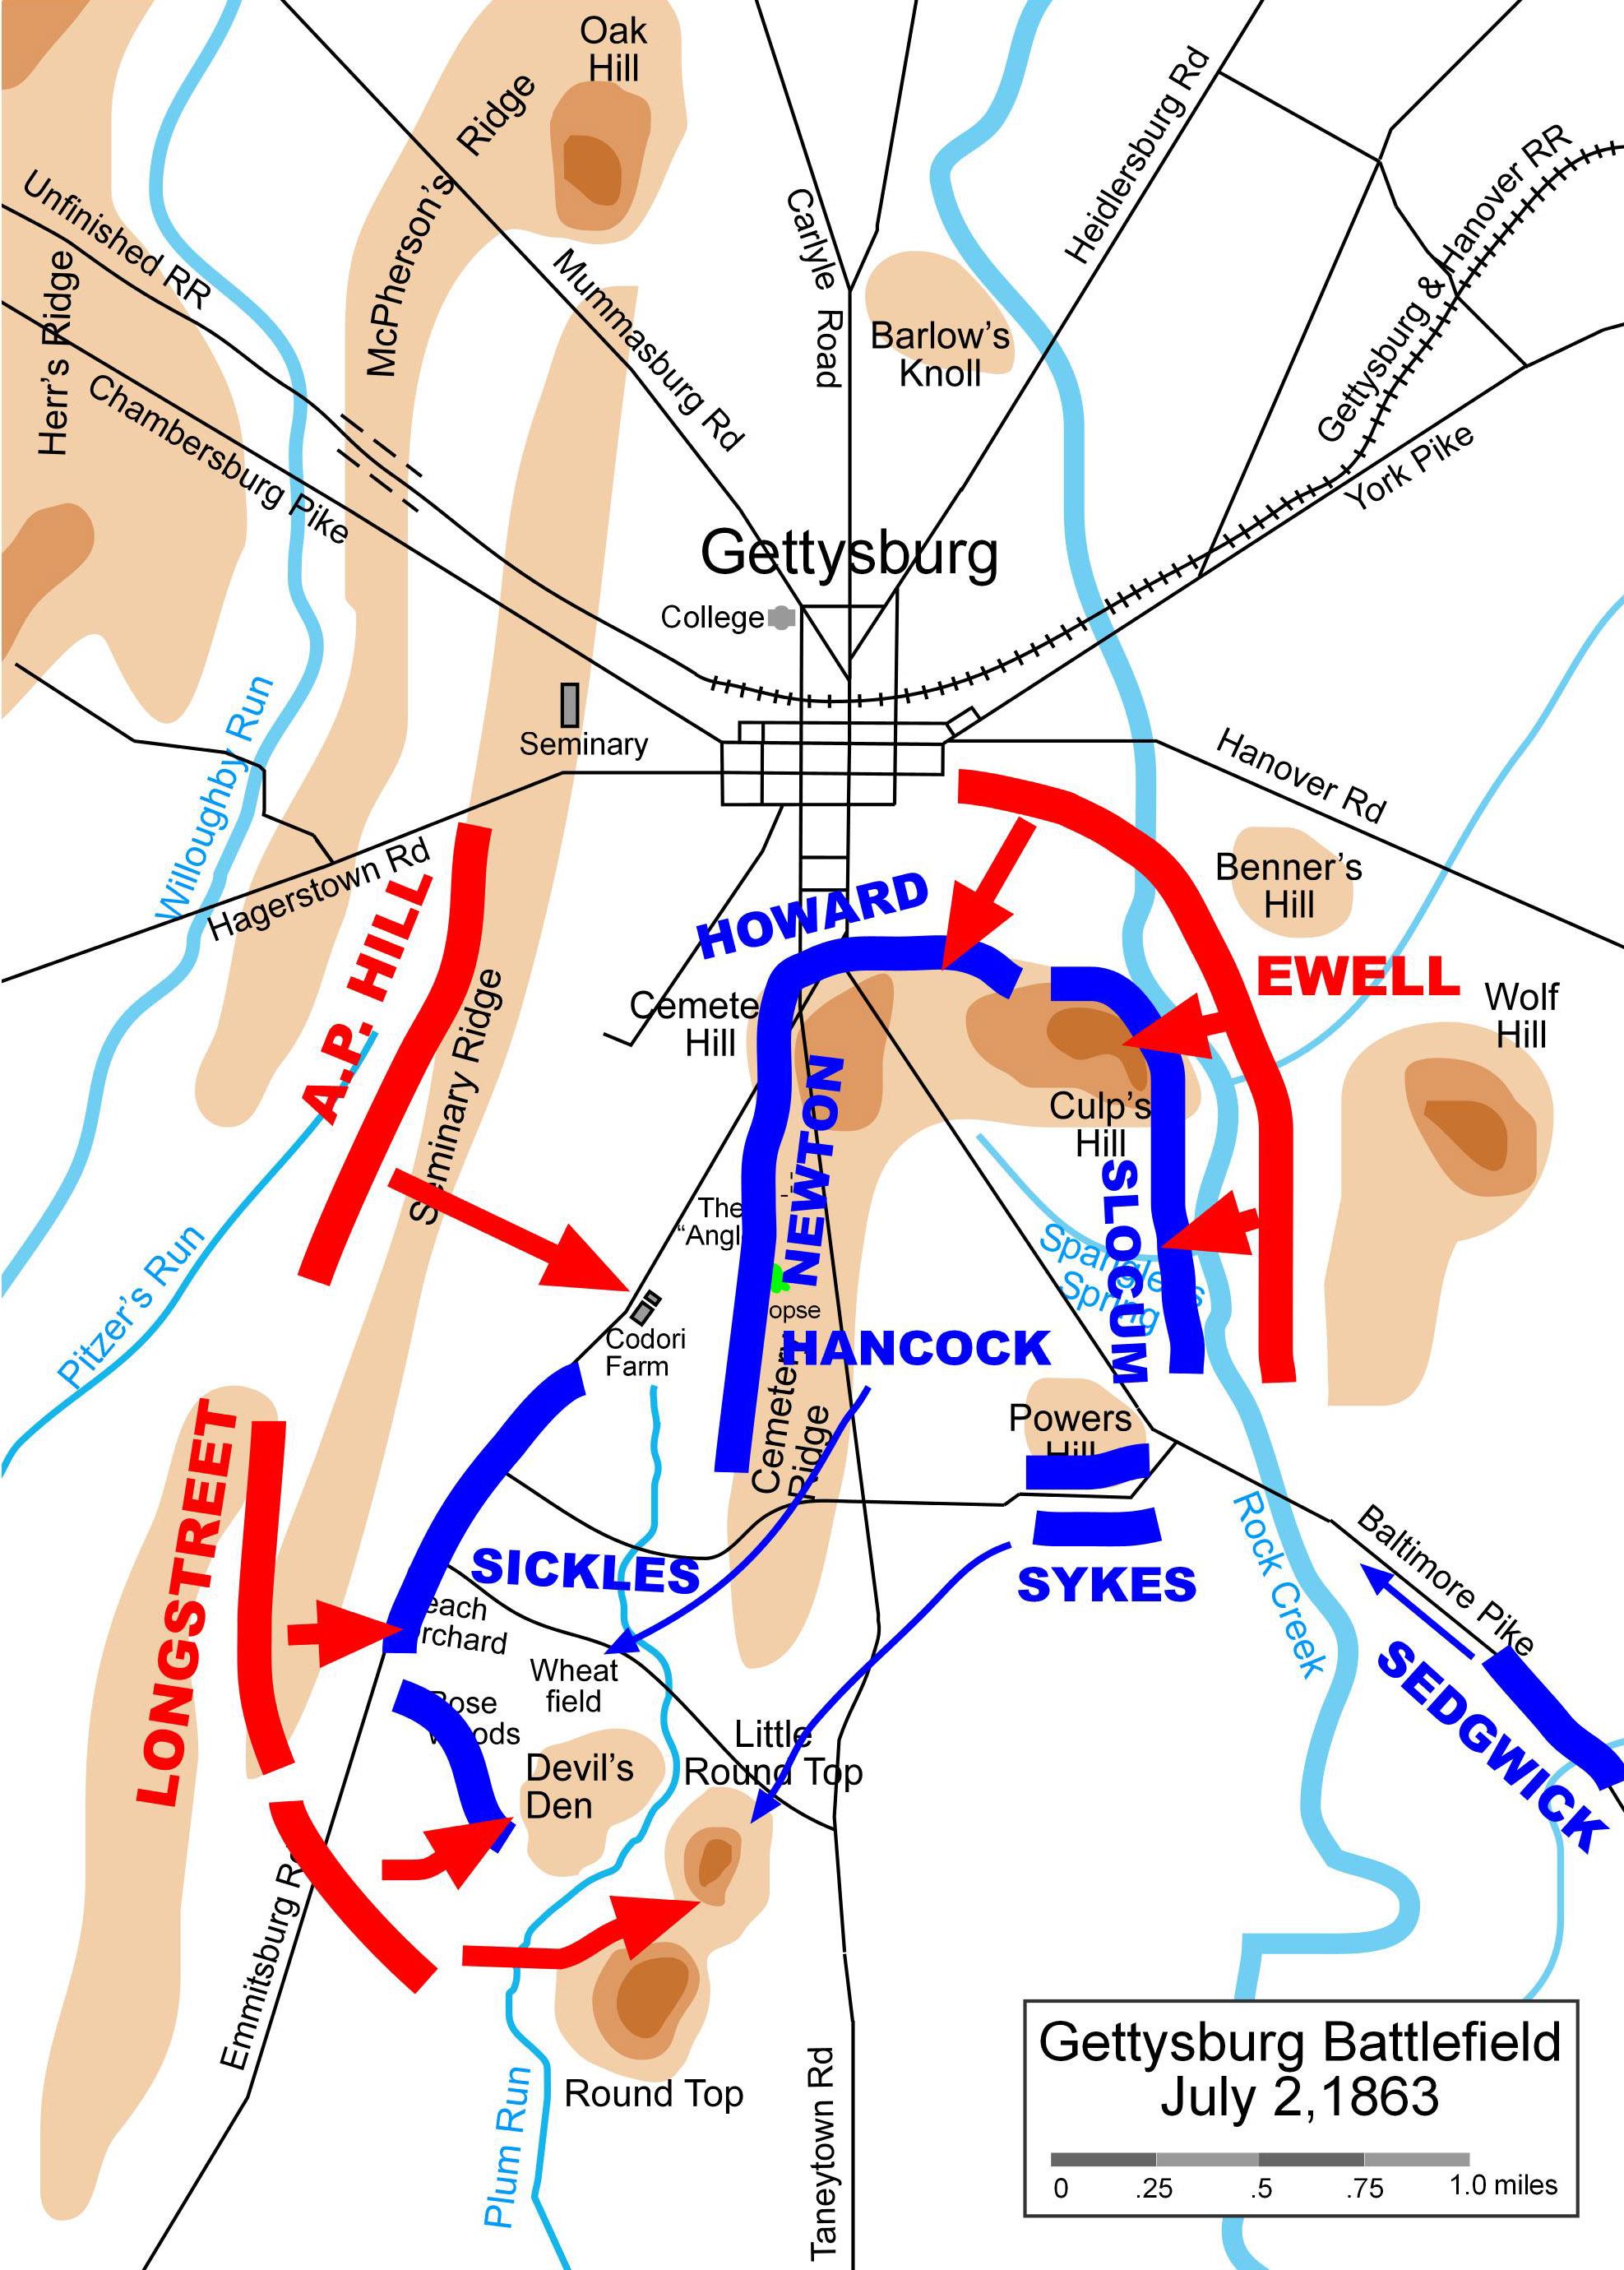 Gettysburg – July 2nd, 1863